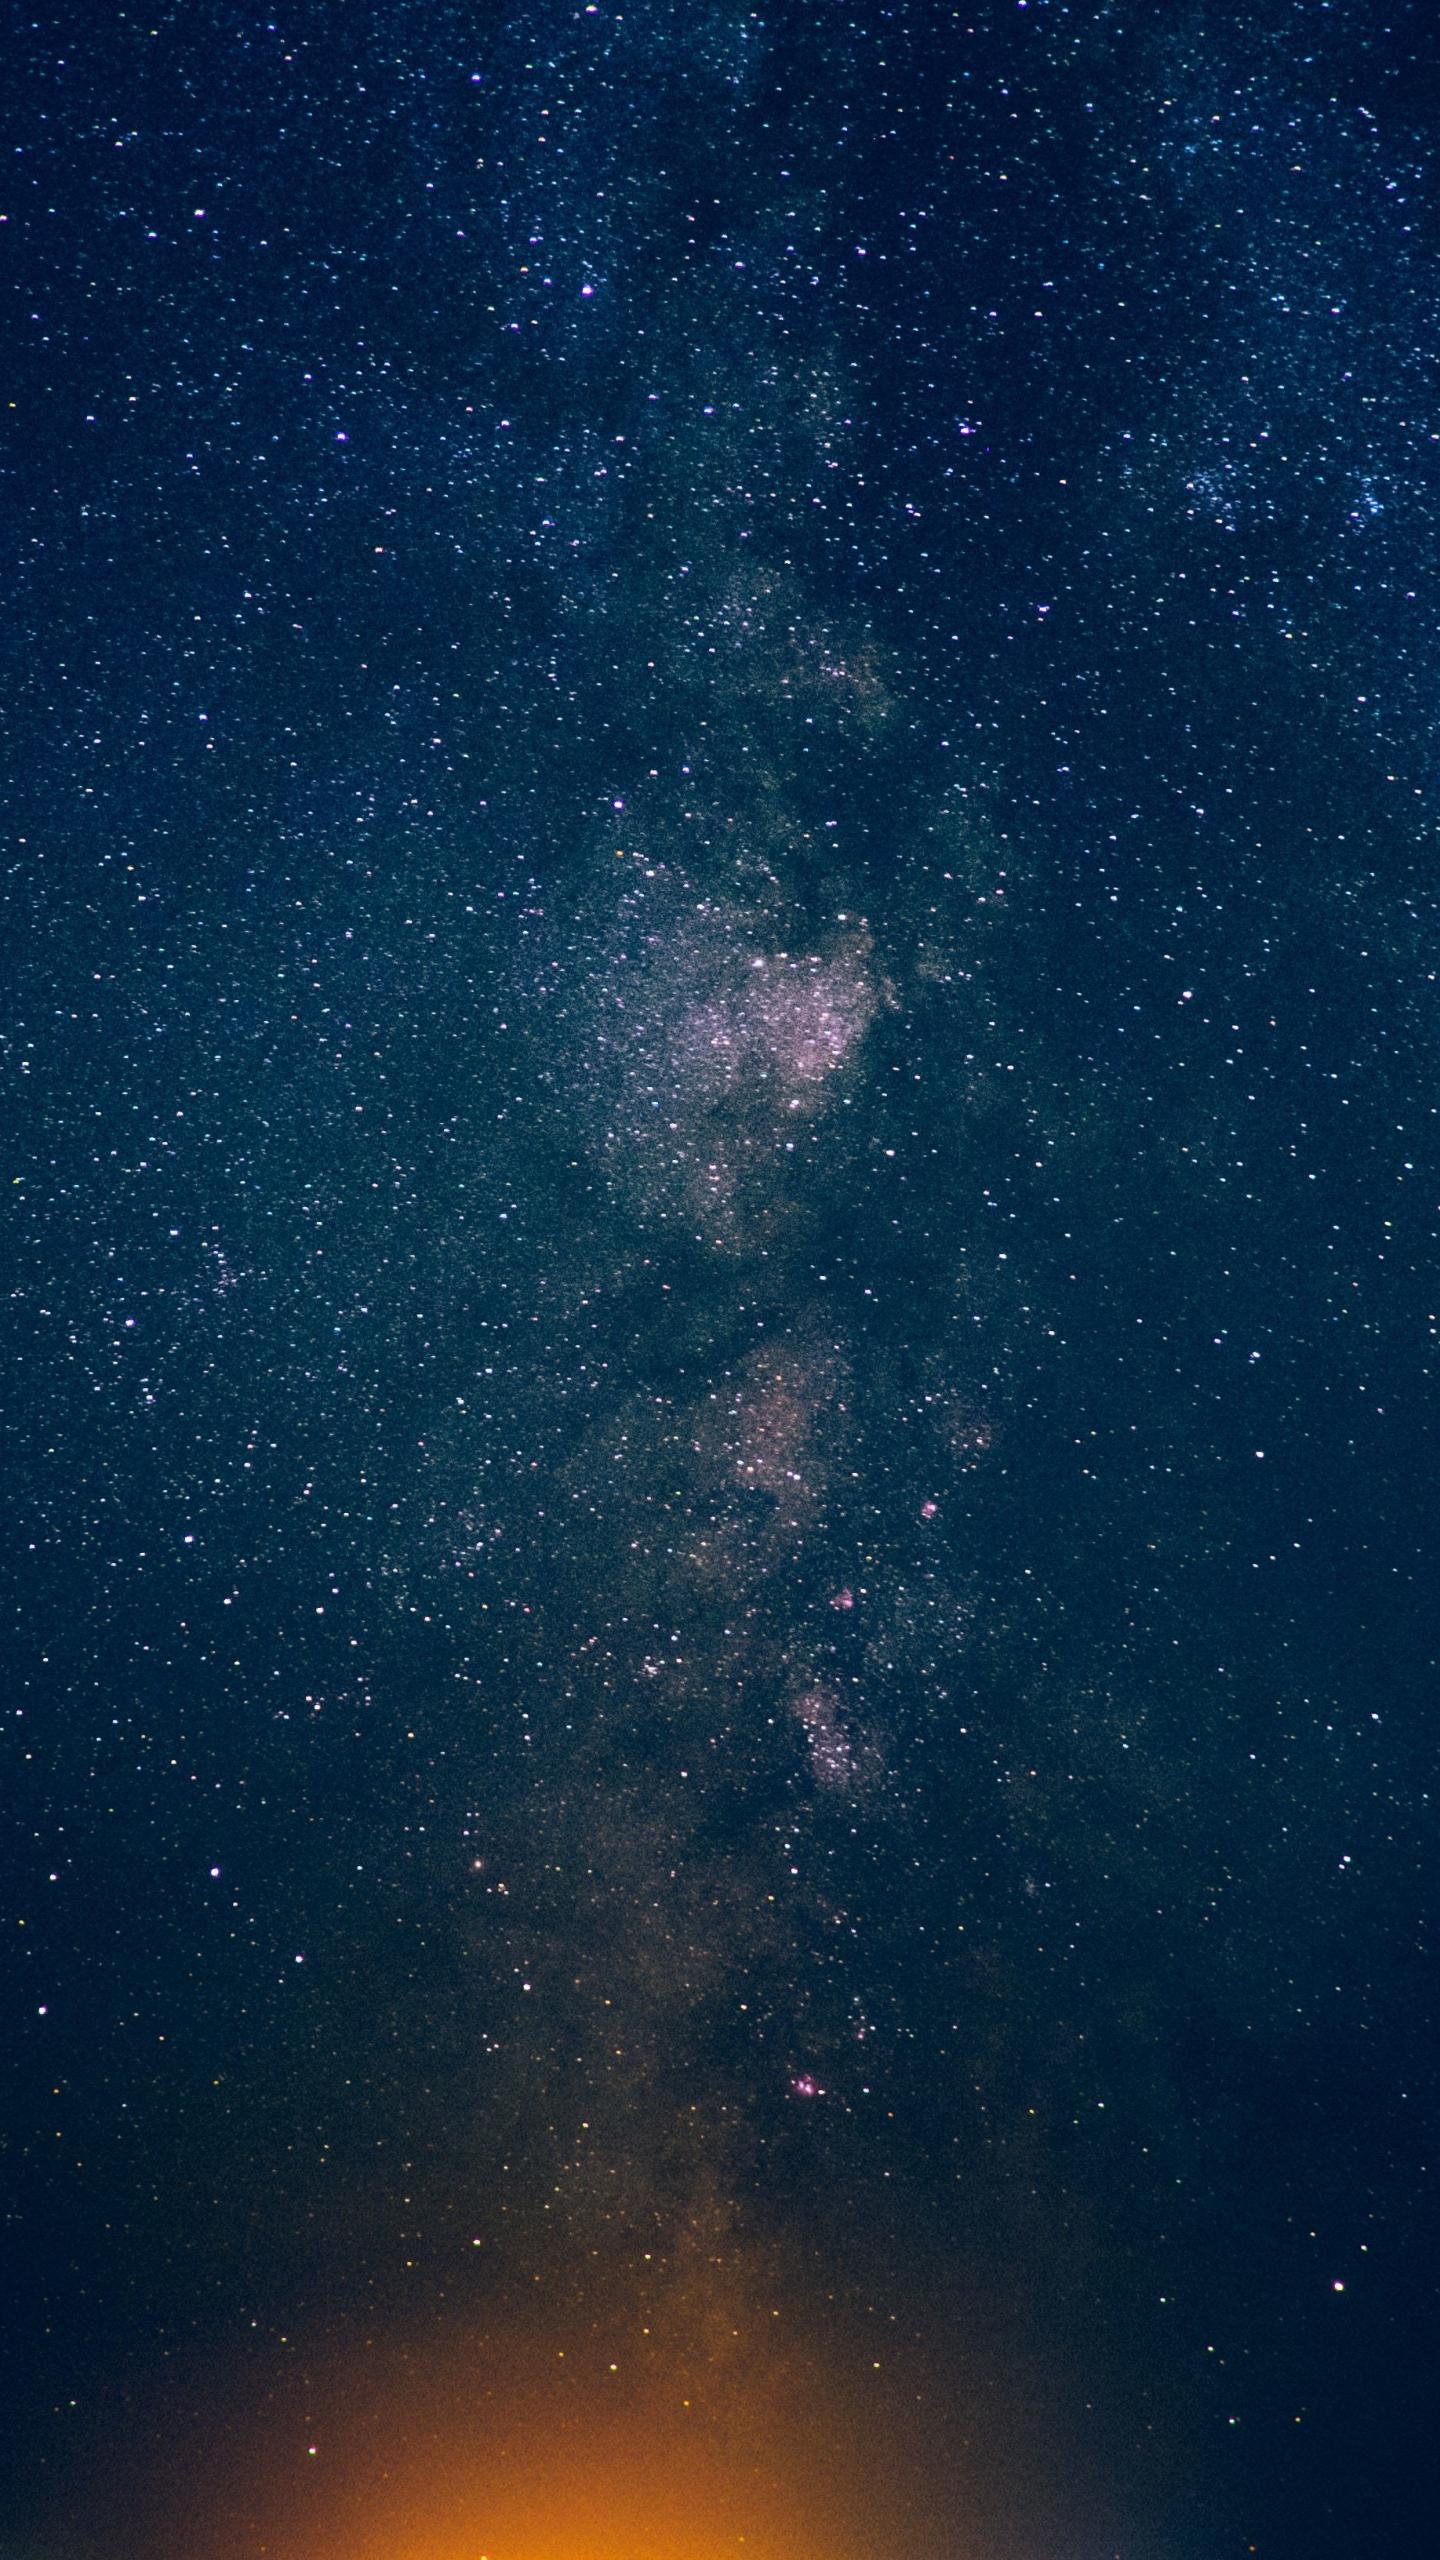 Download 1440x2560 Wallpaper Night Sky Stars Milky Way